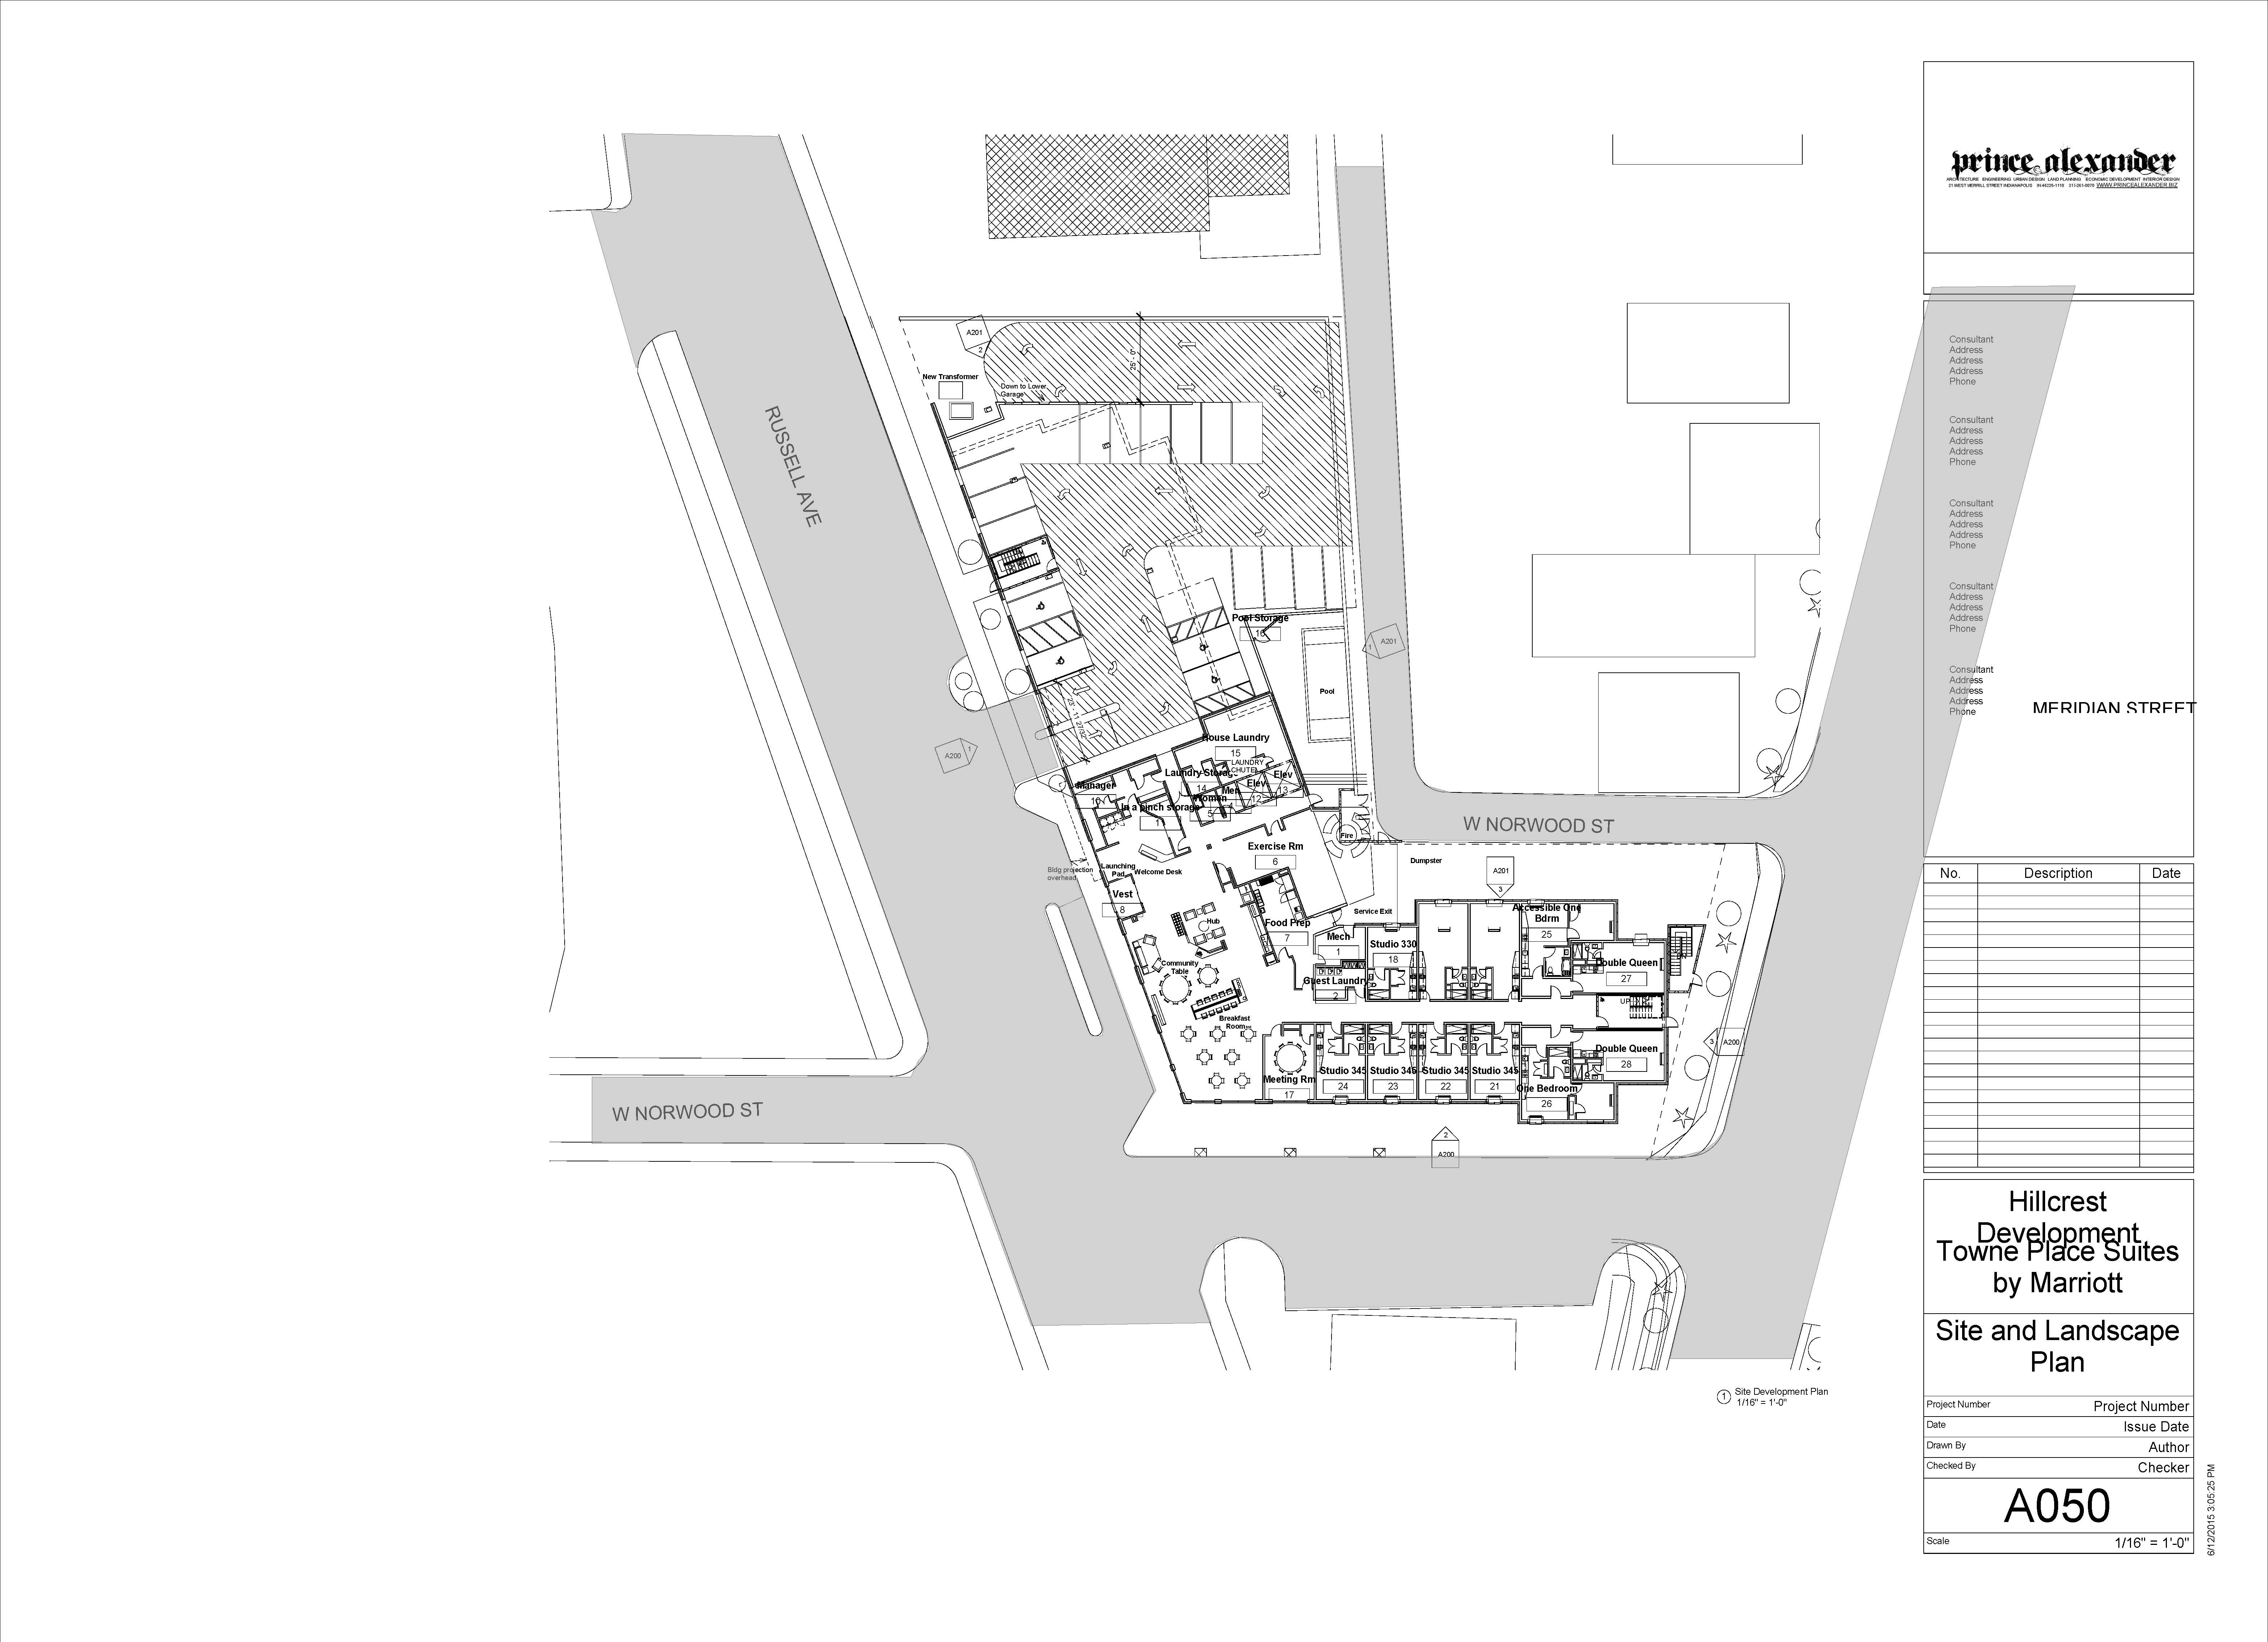 A050 - Site and Landscape Plan